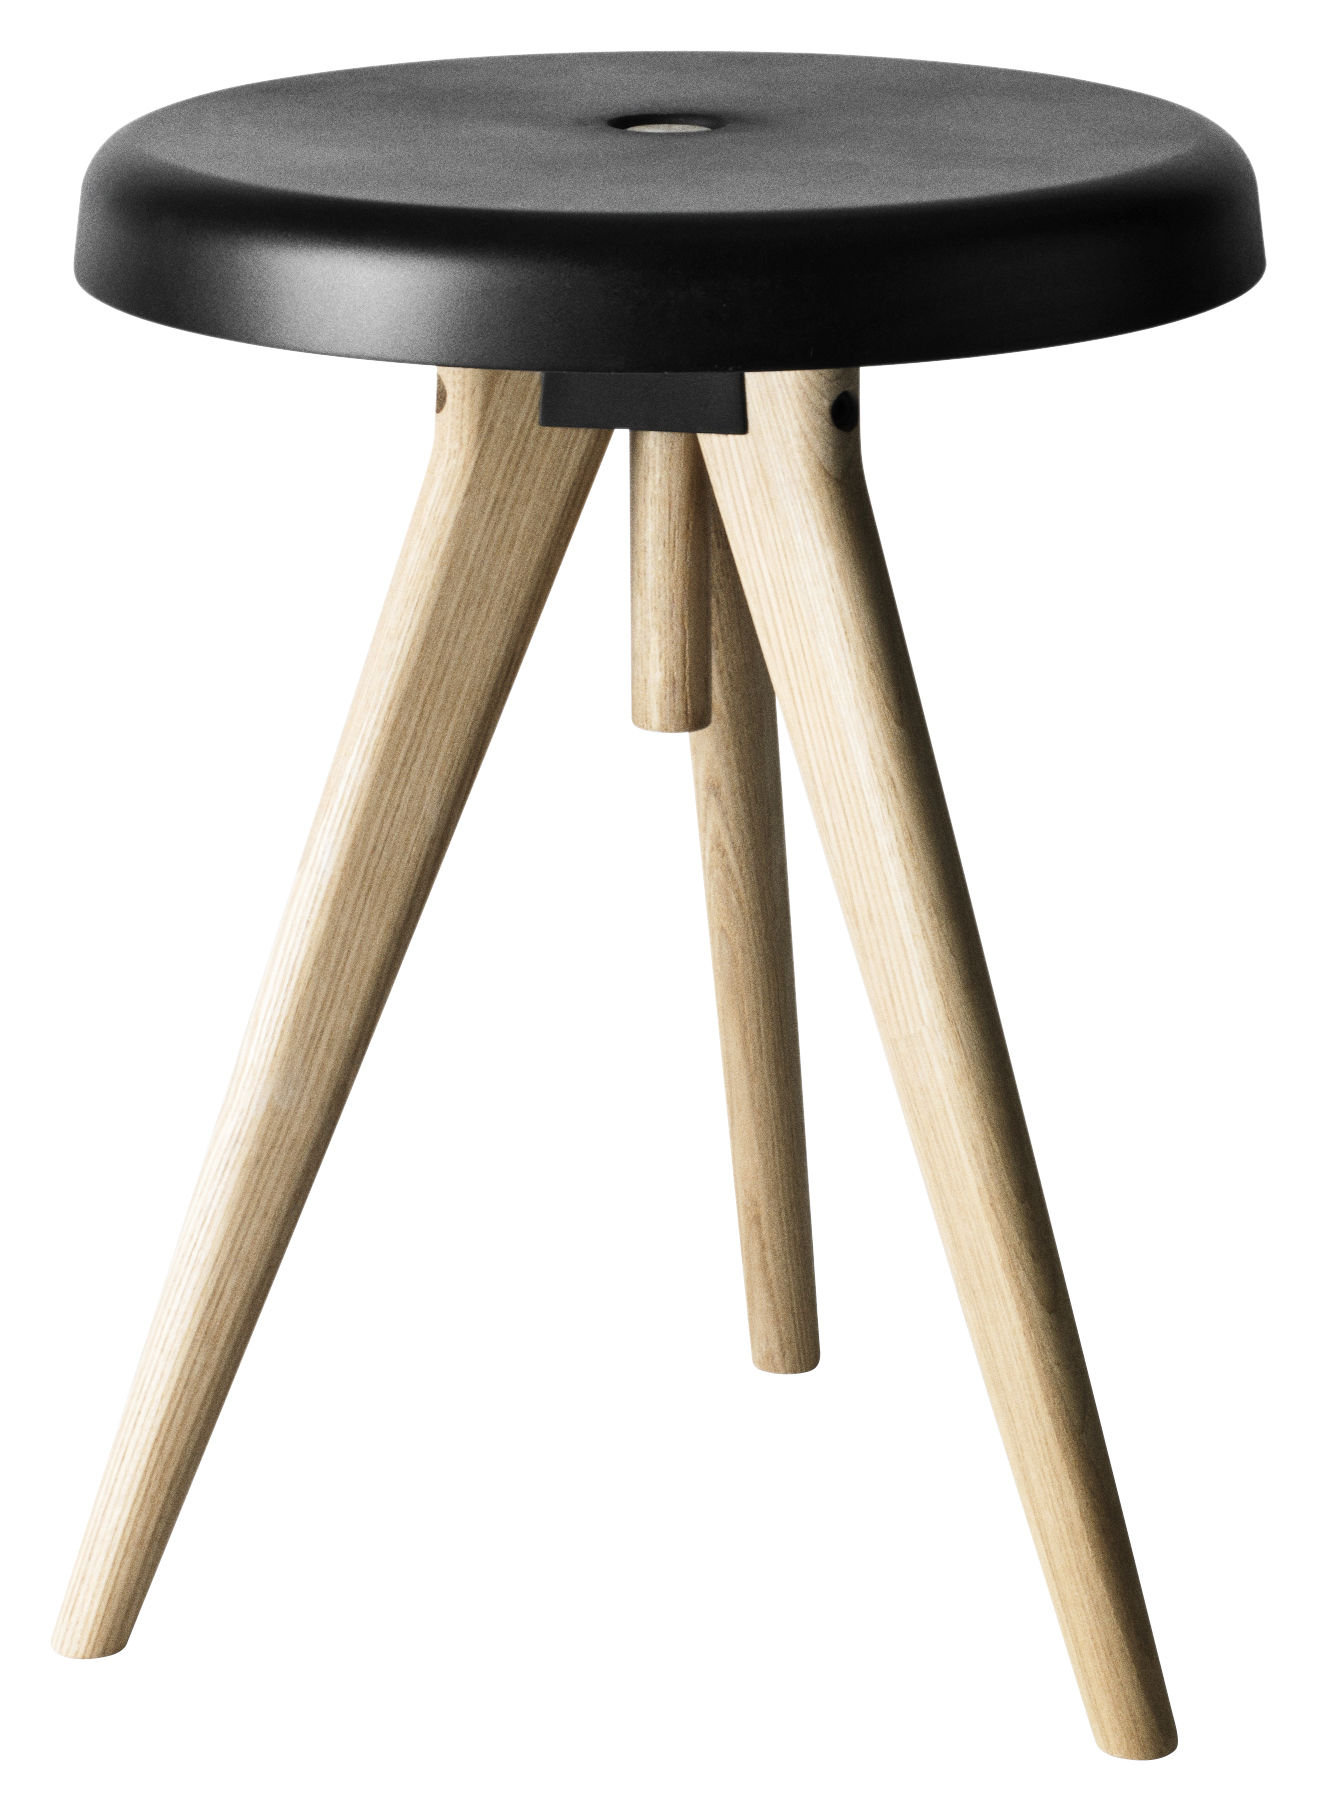 tabouret flip around table d 39 appoint h 46 cm noir bois clair menu. Black Bedroom Furniture Sets. Home Design Ideas